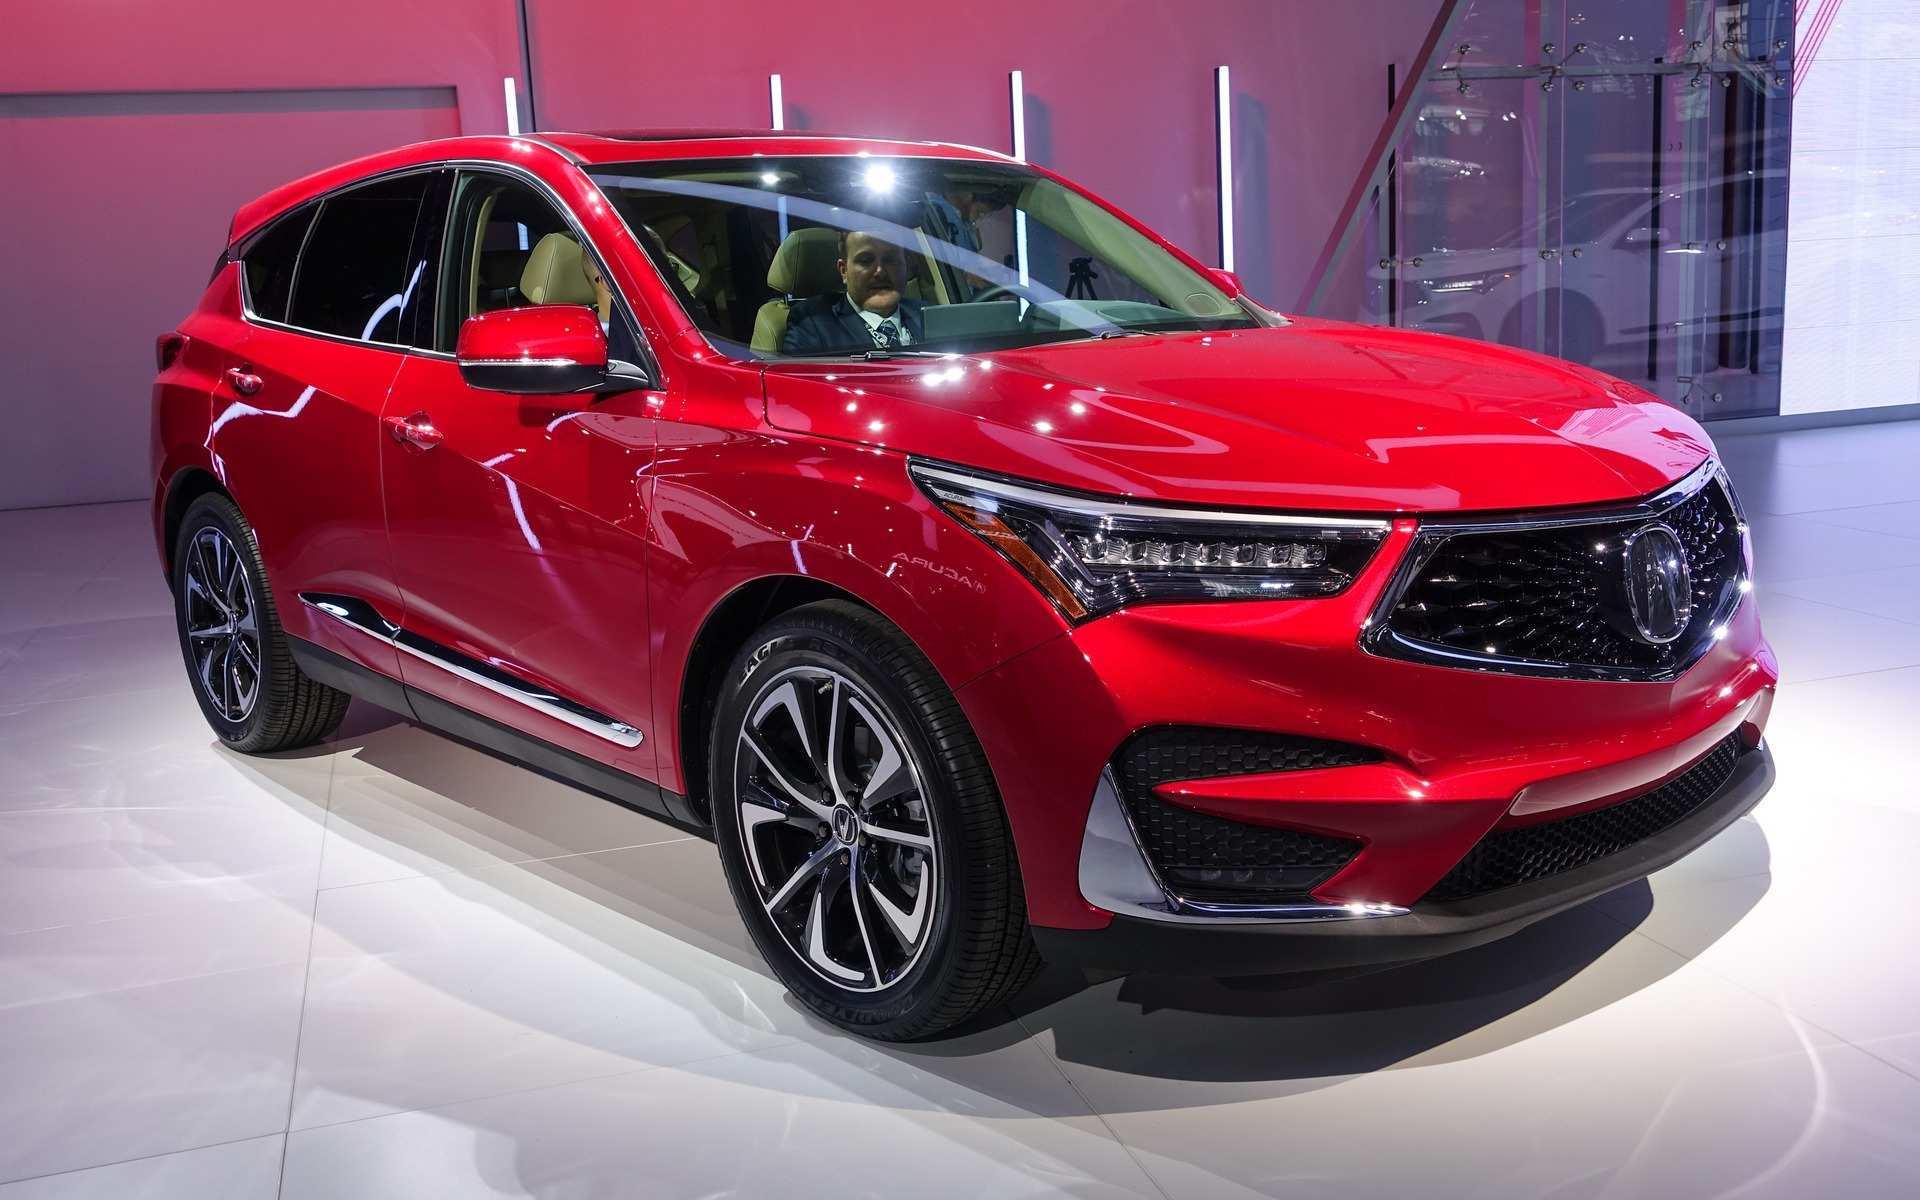 73 Concept of 2020 Acura Mdx Detroit Auto Show Concept for 2020 Acura Mdx Detroit Auto Show